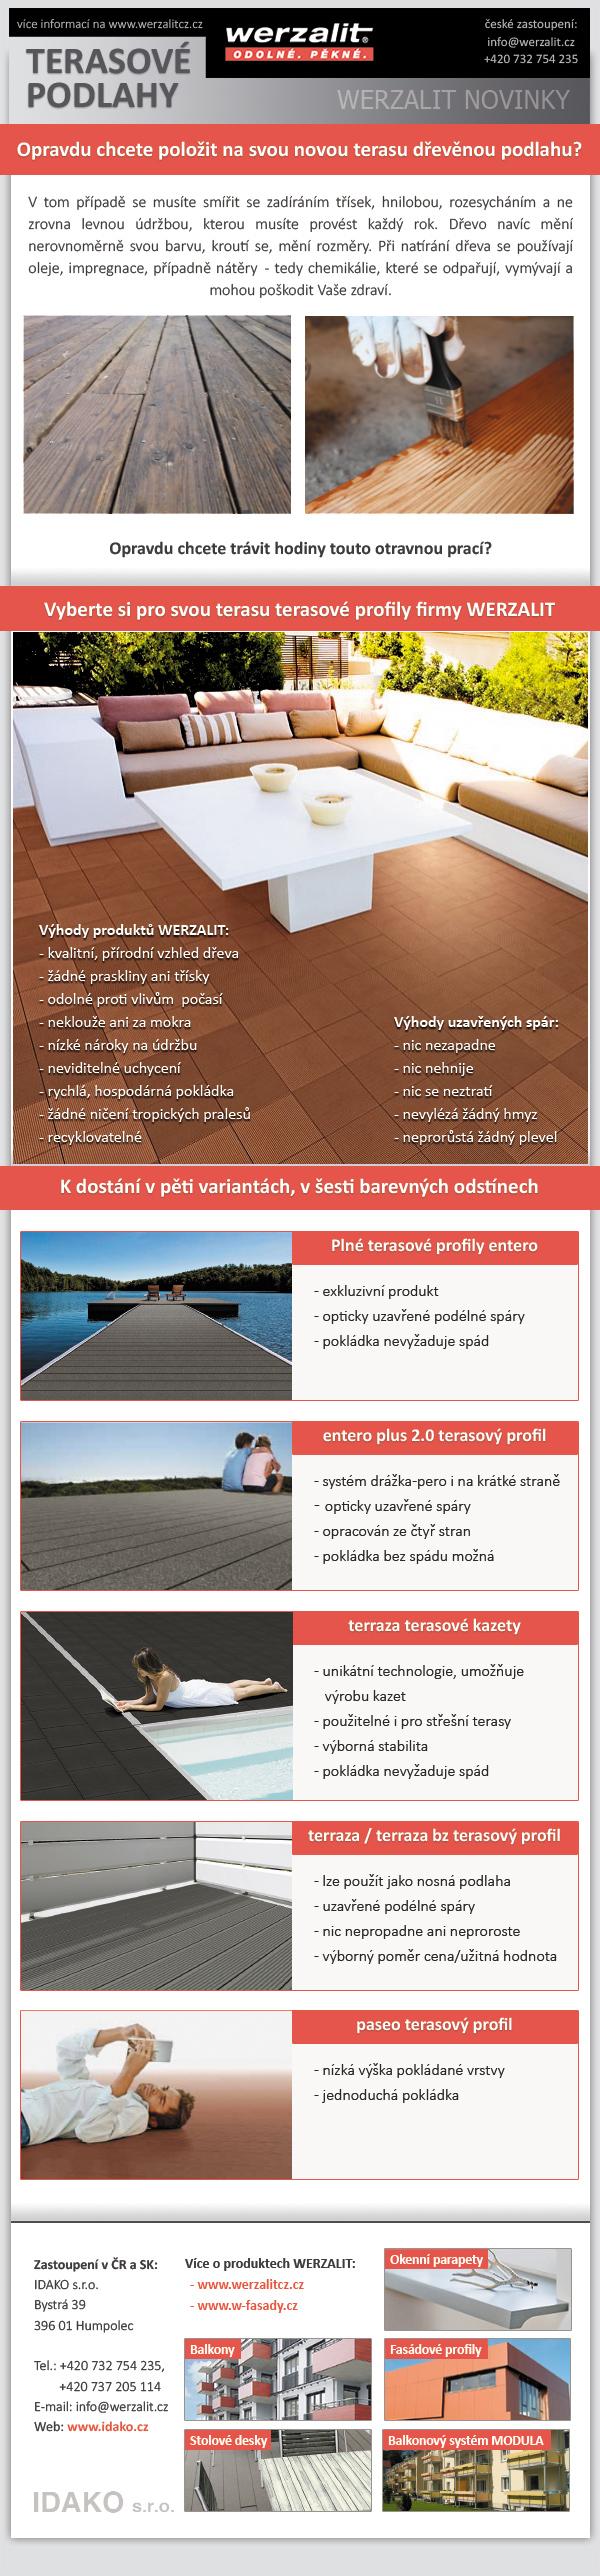 Terasové podlahy werzalit